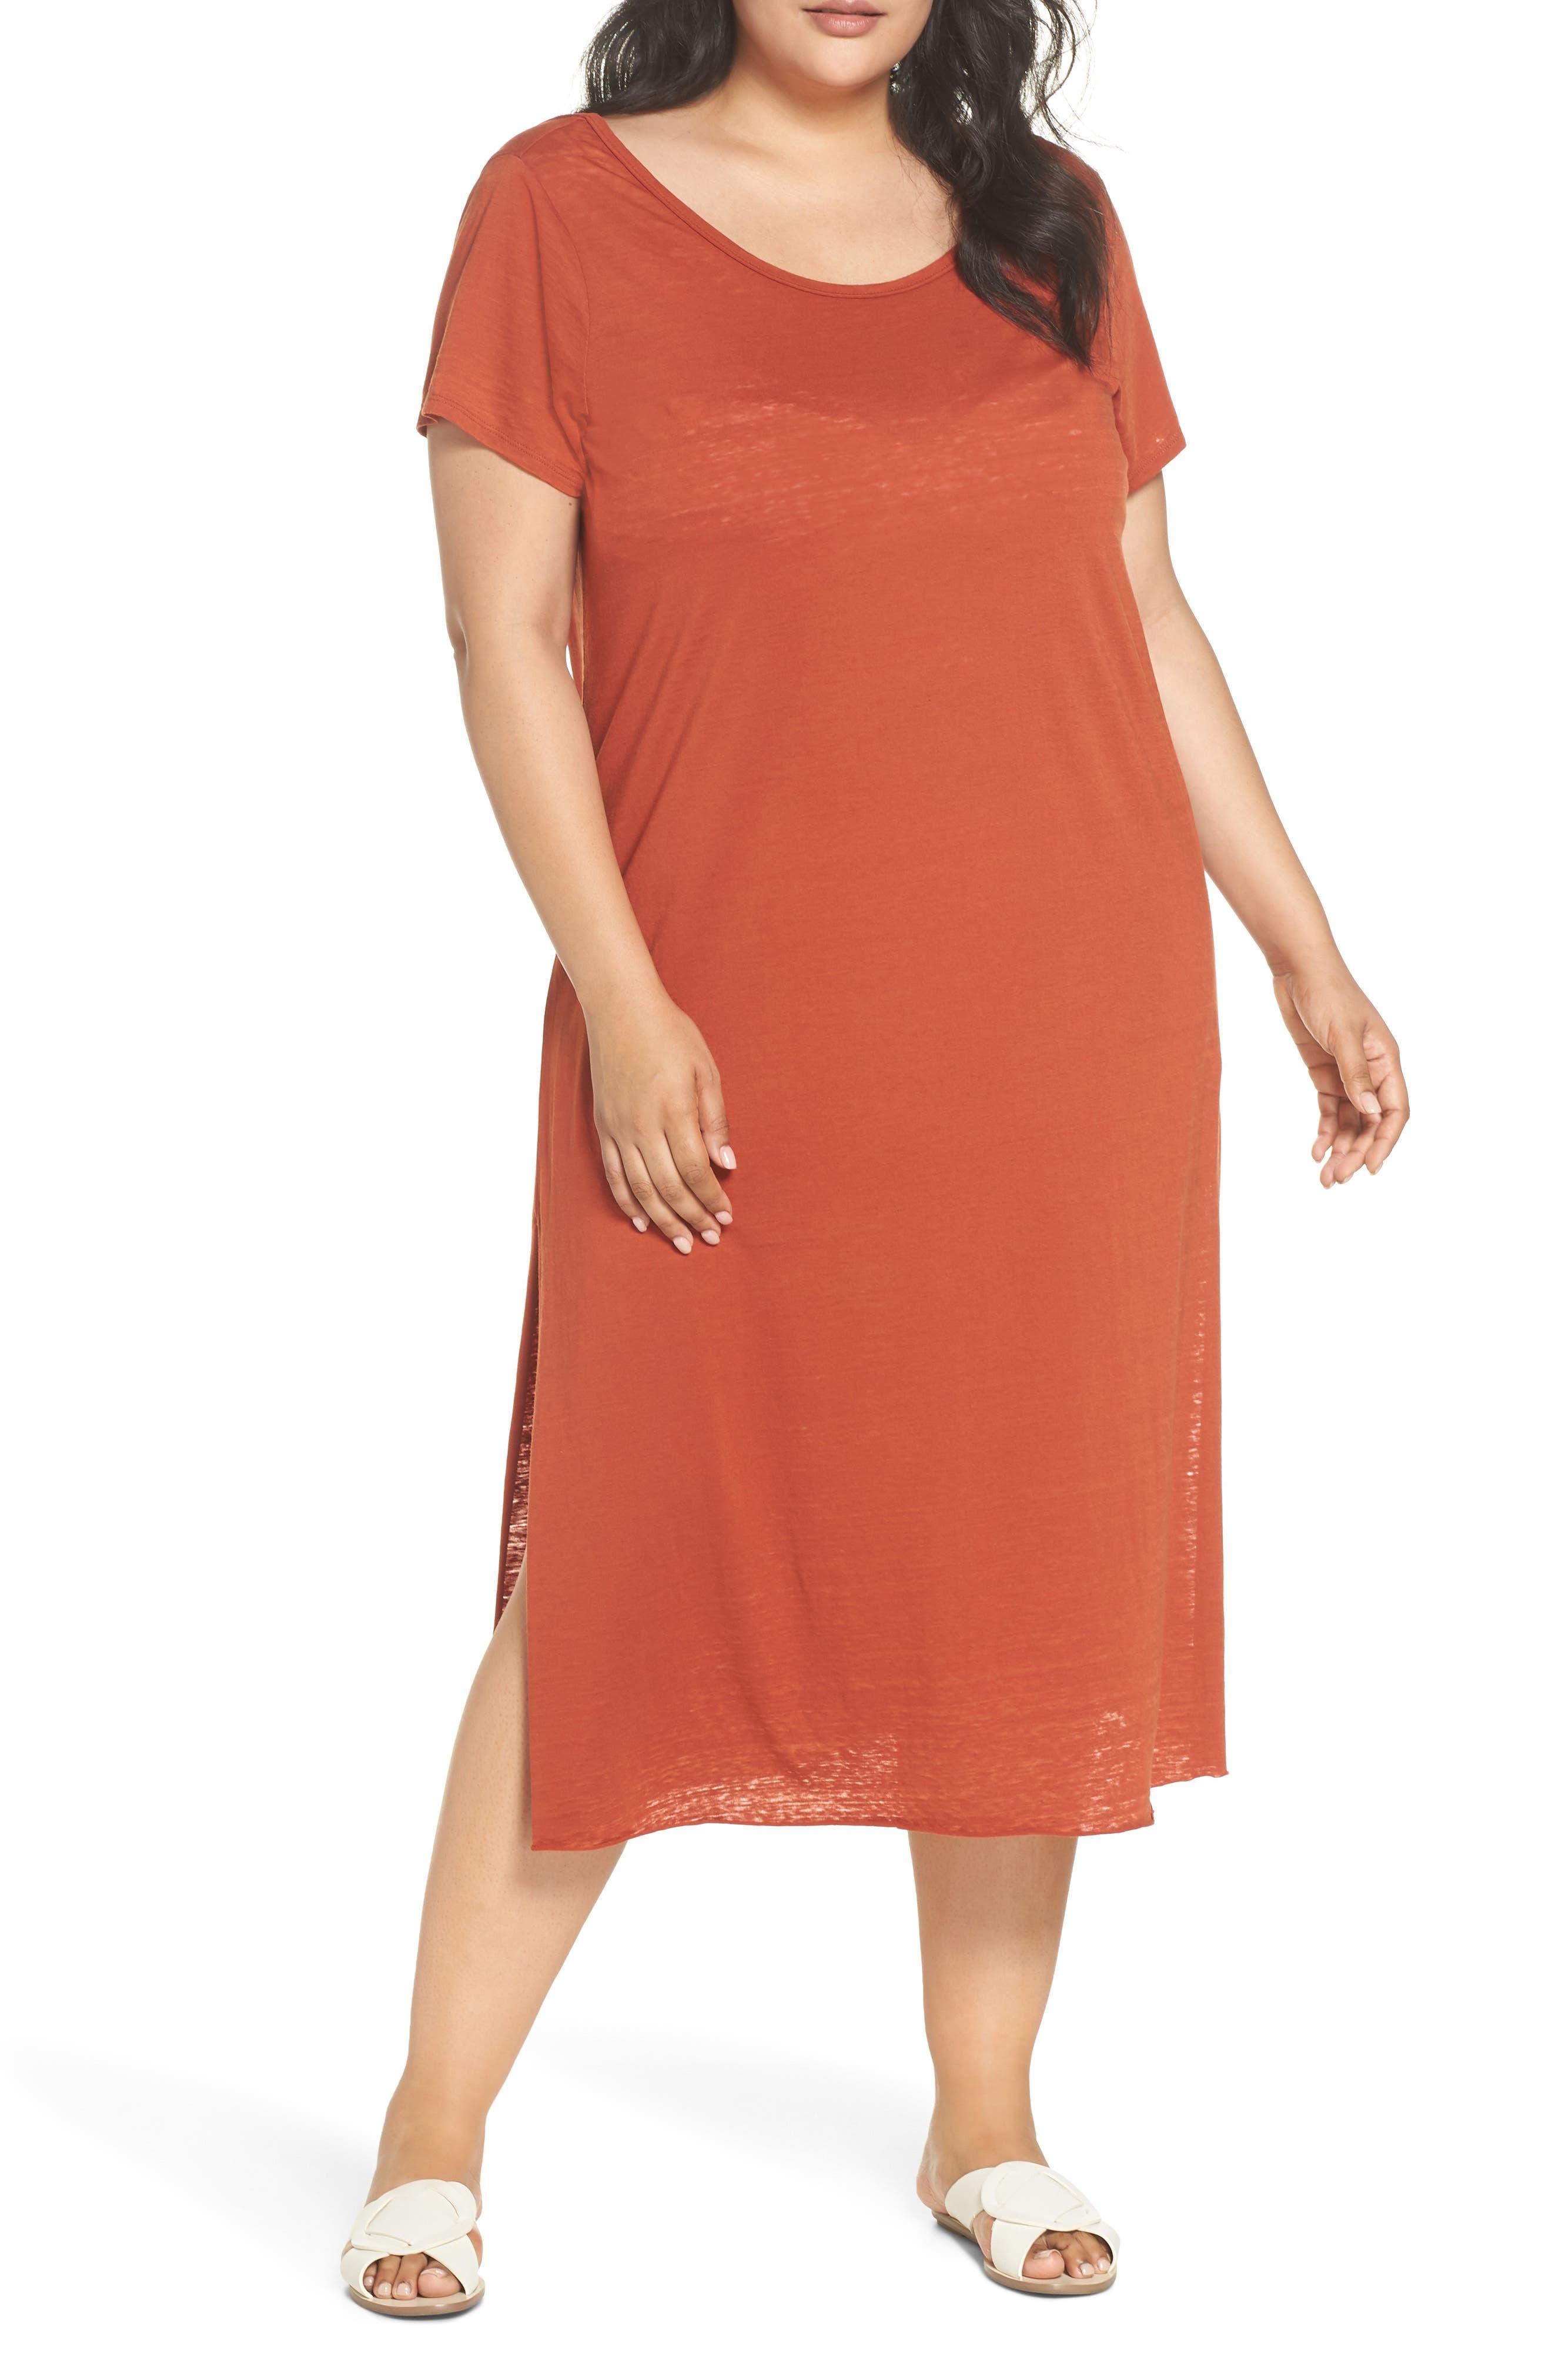 Easy Burnout Cover-Up T-Shirt Dress,                             Main thumbnail 1, color,                             221